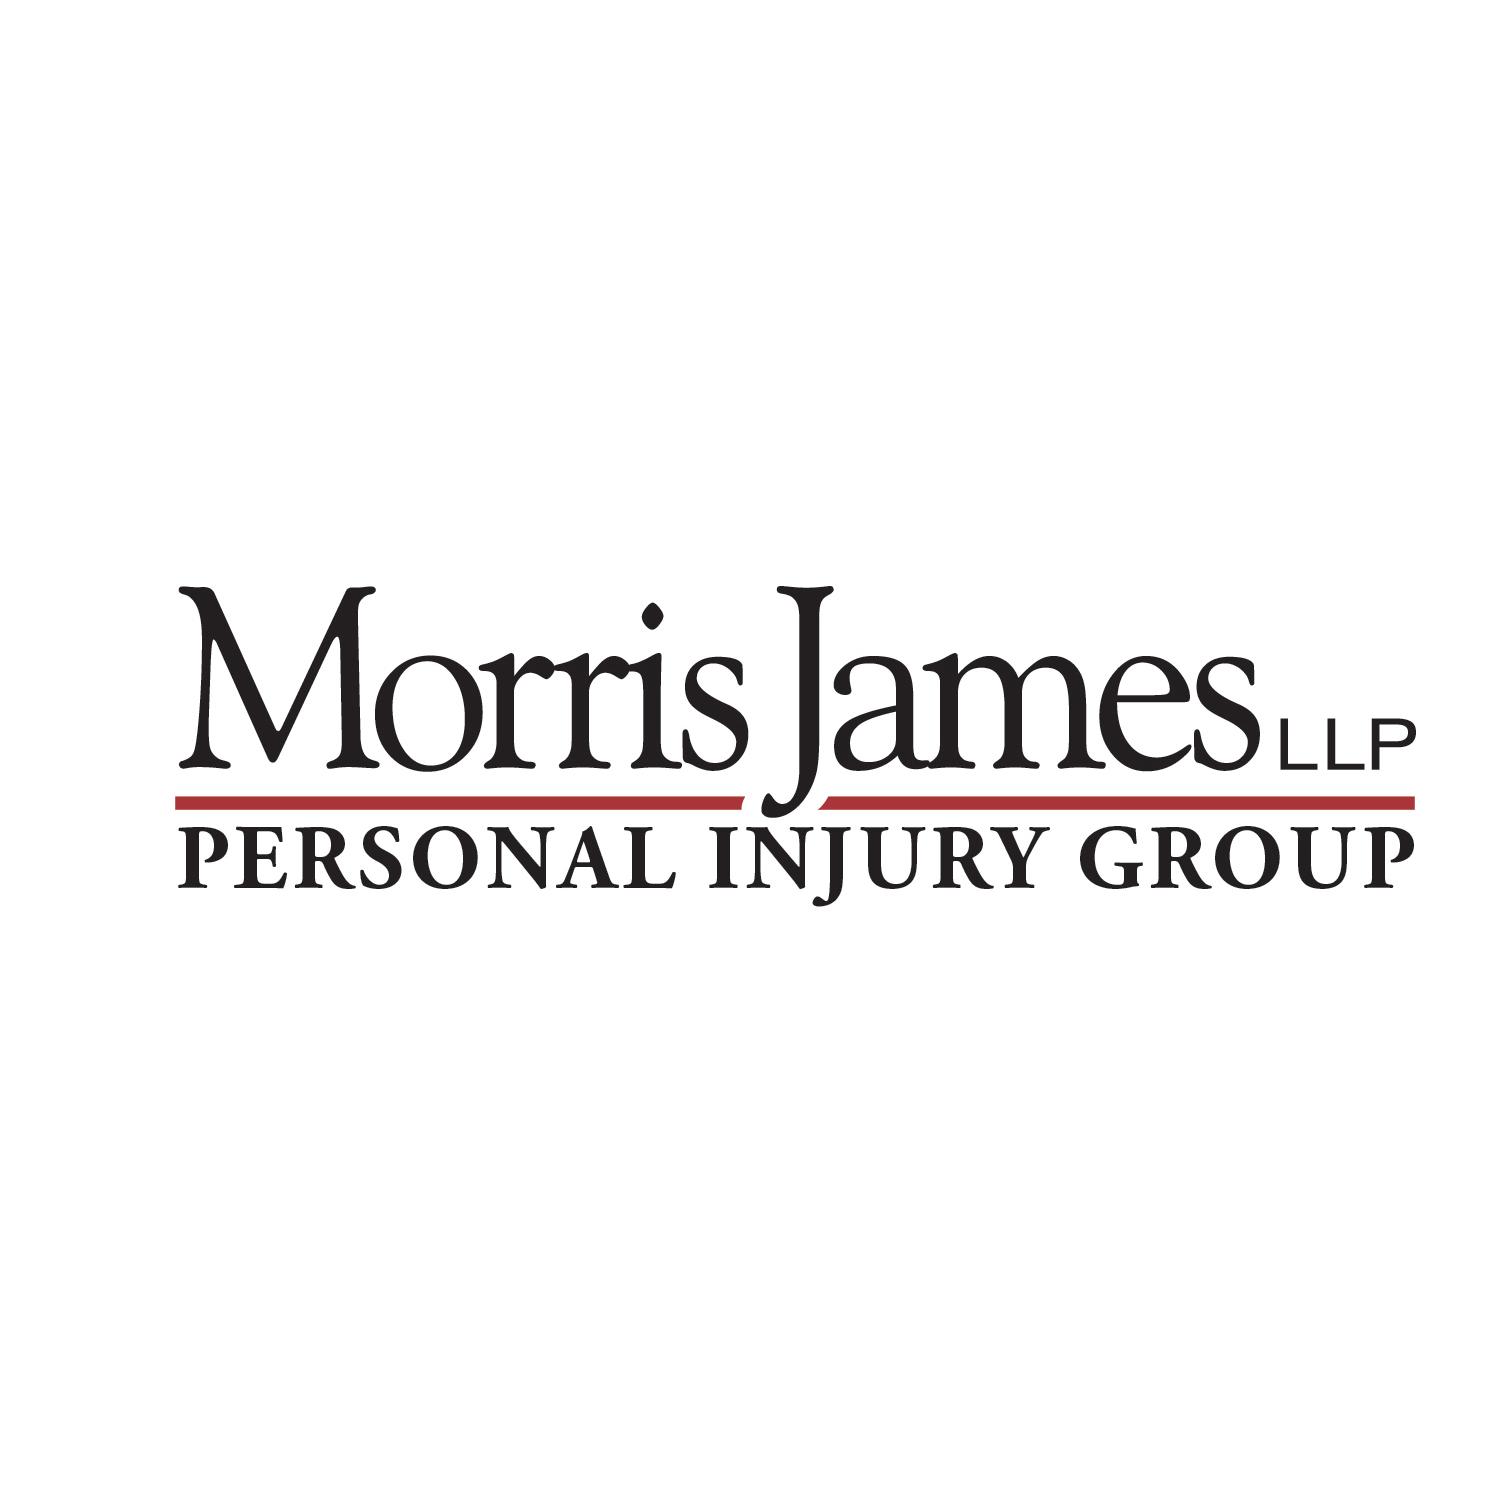 Morris James Personal Injury Group